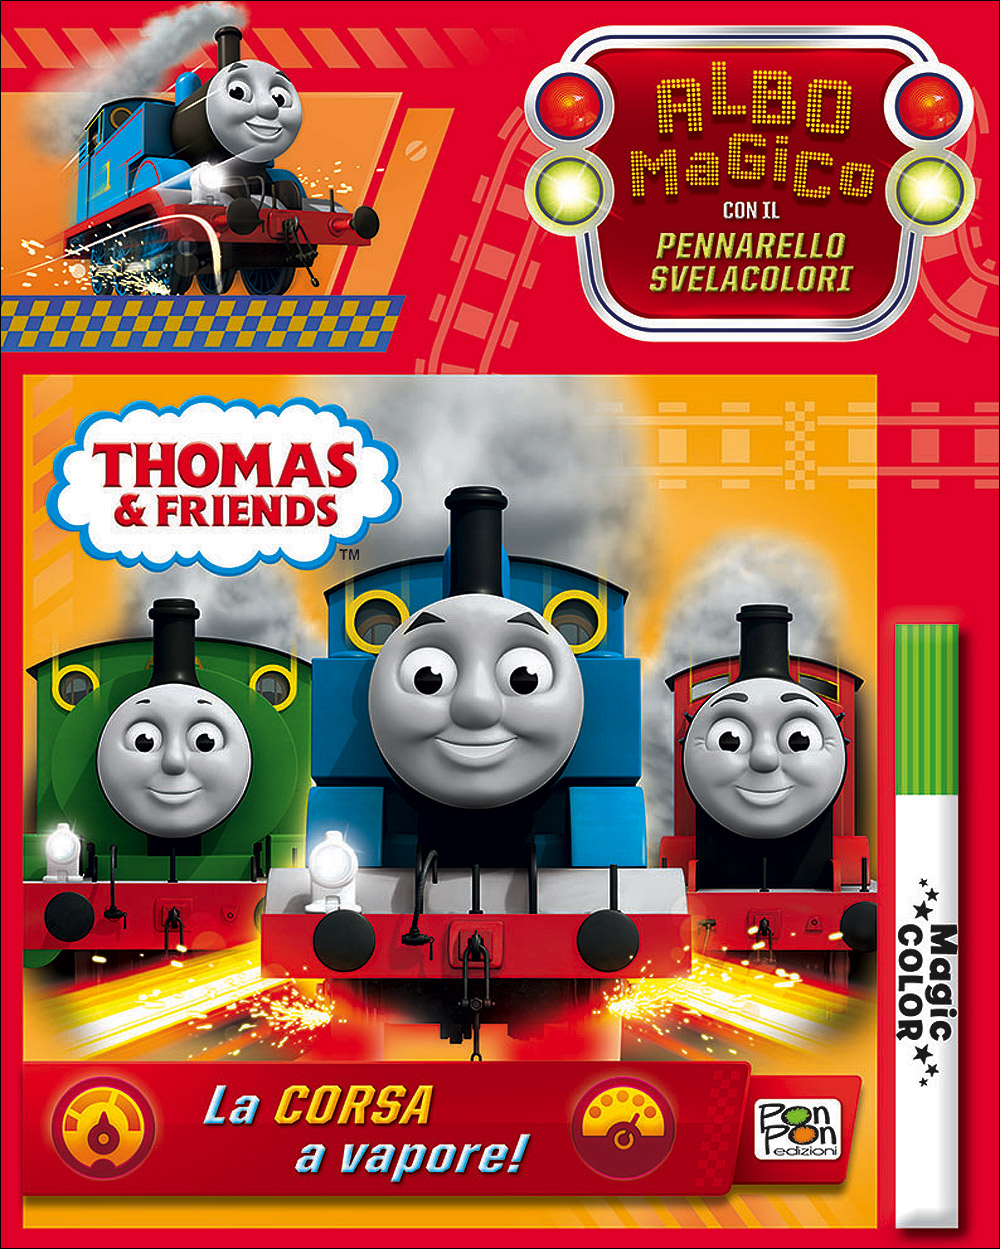 Albo Magico Trenino Thomas - La corsa a vapore!